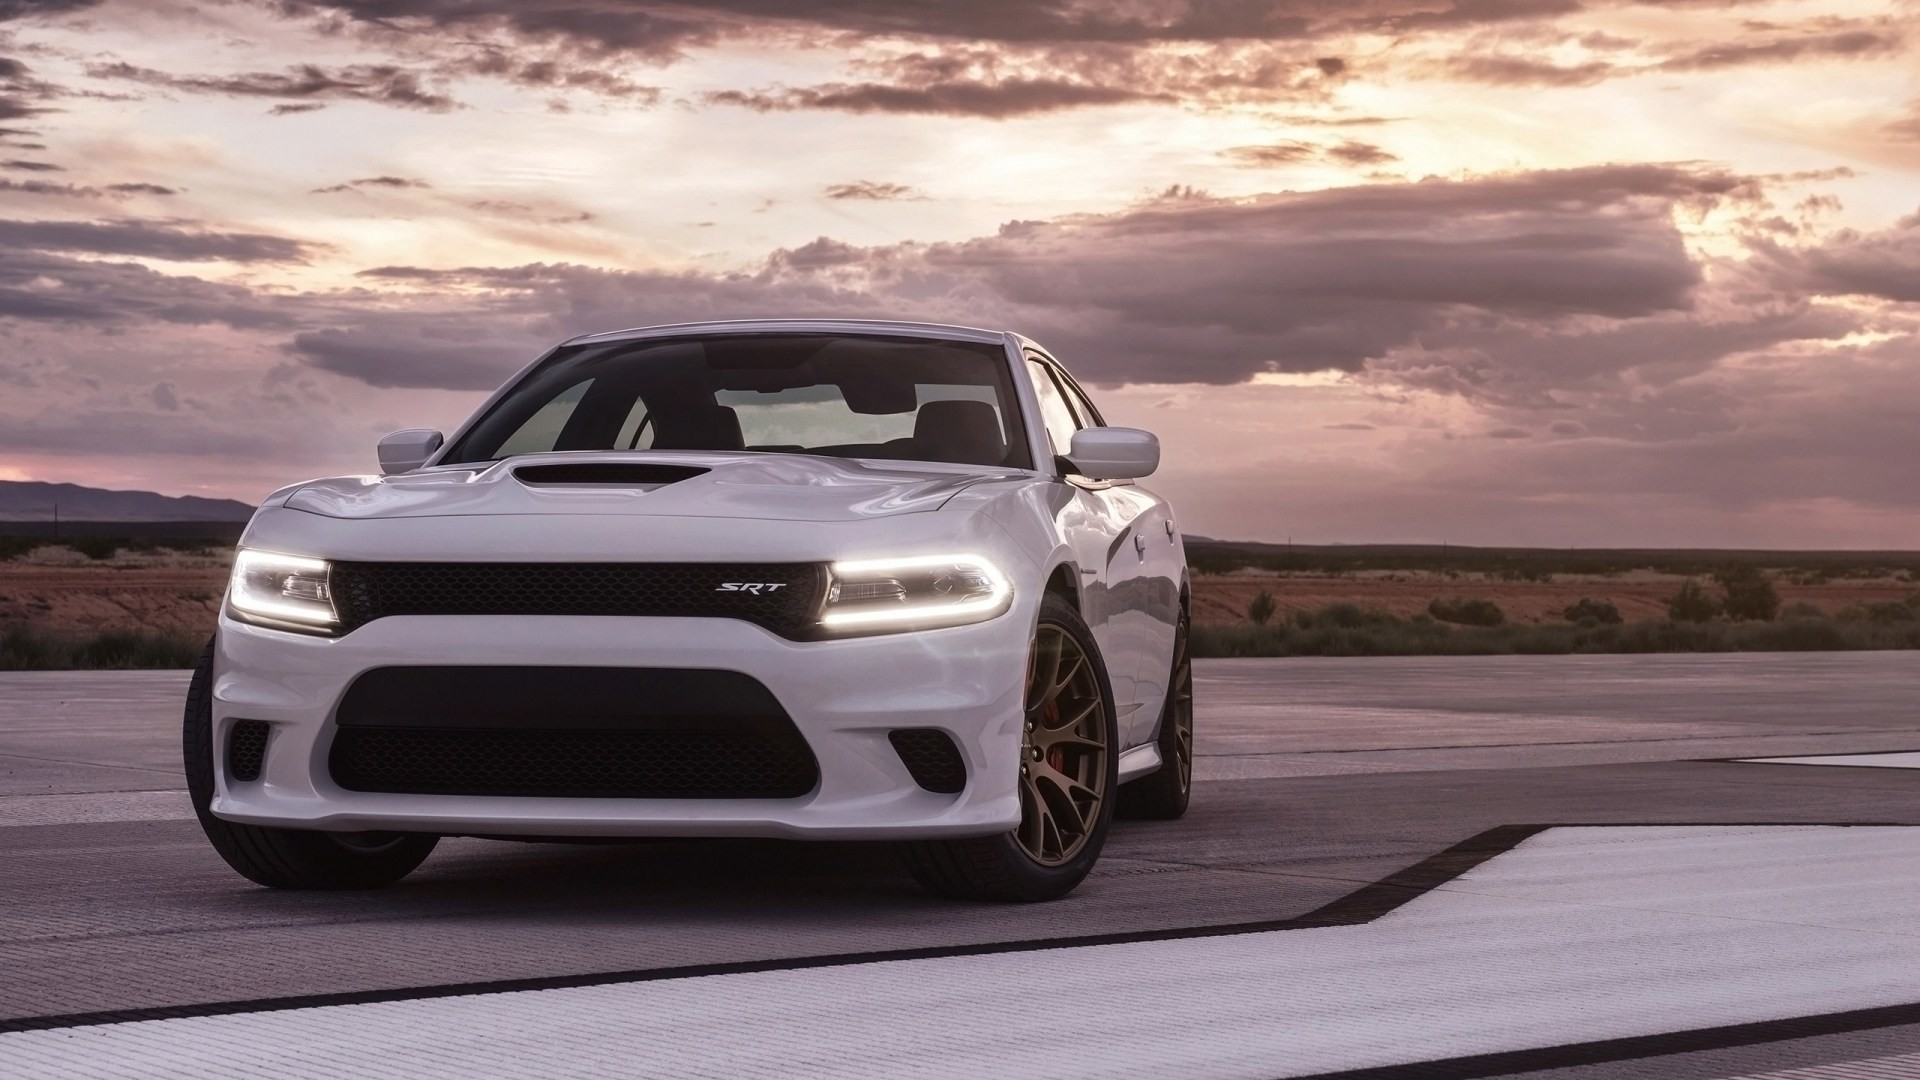 Dodge Charger Hellcat Wallpaper …